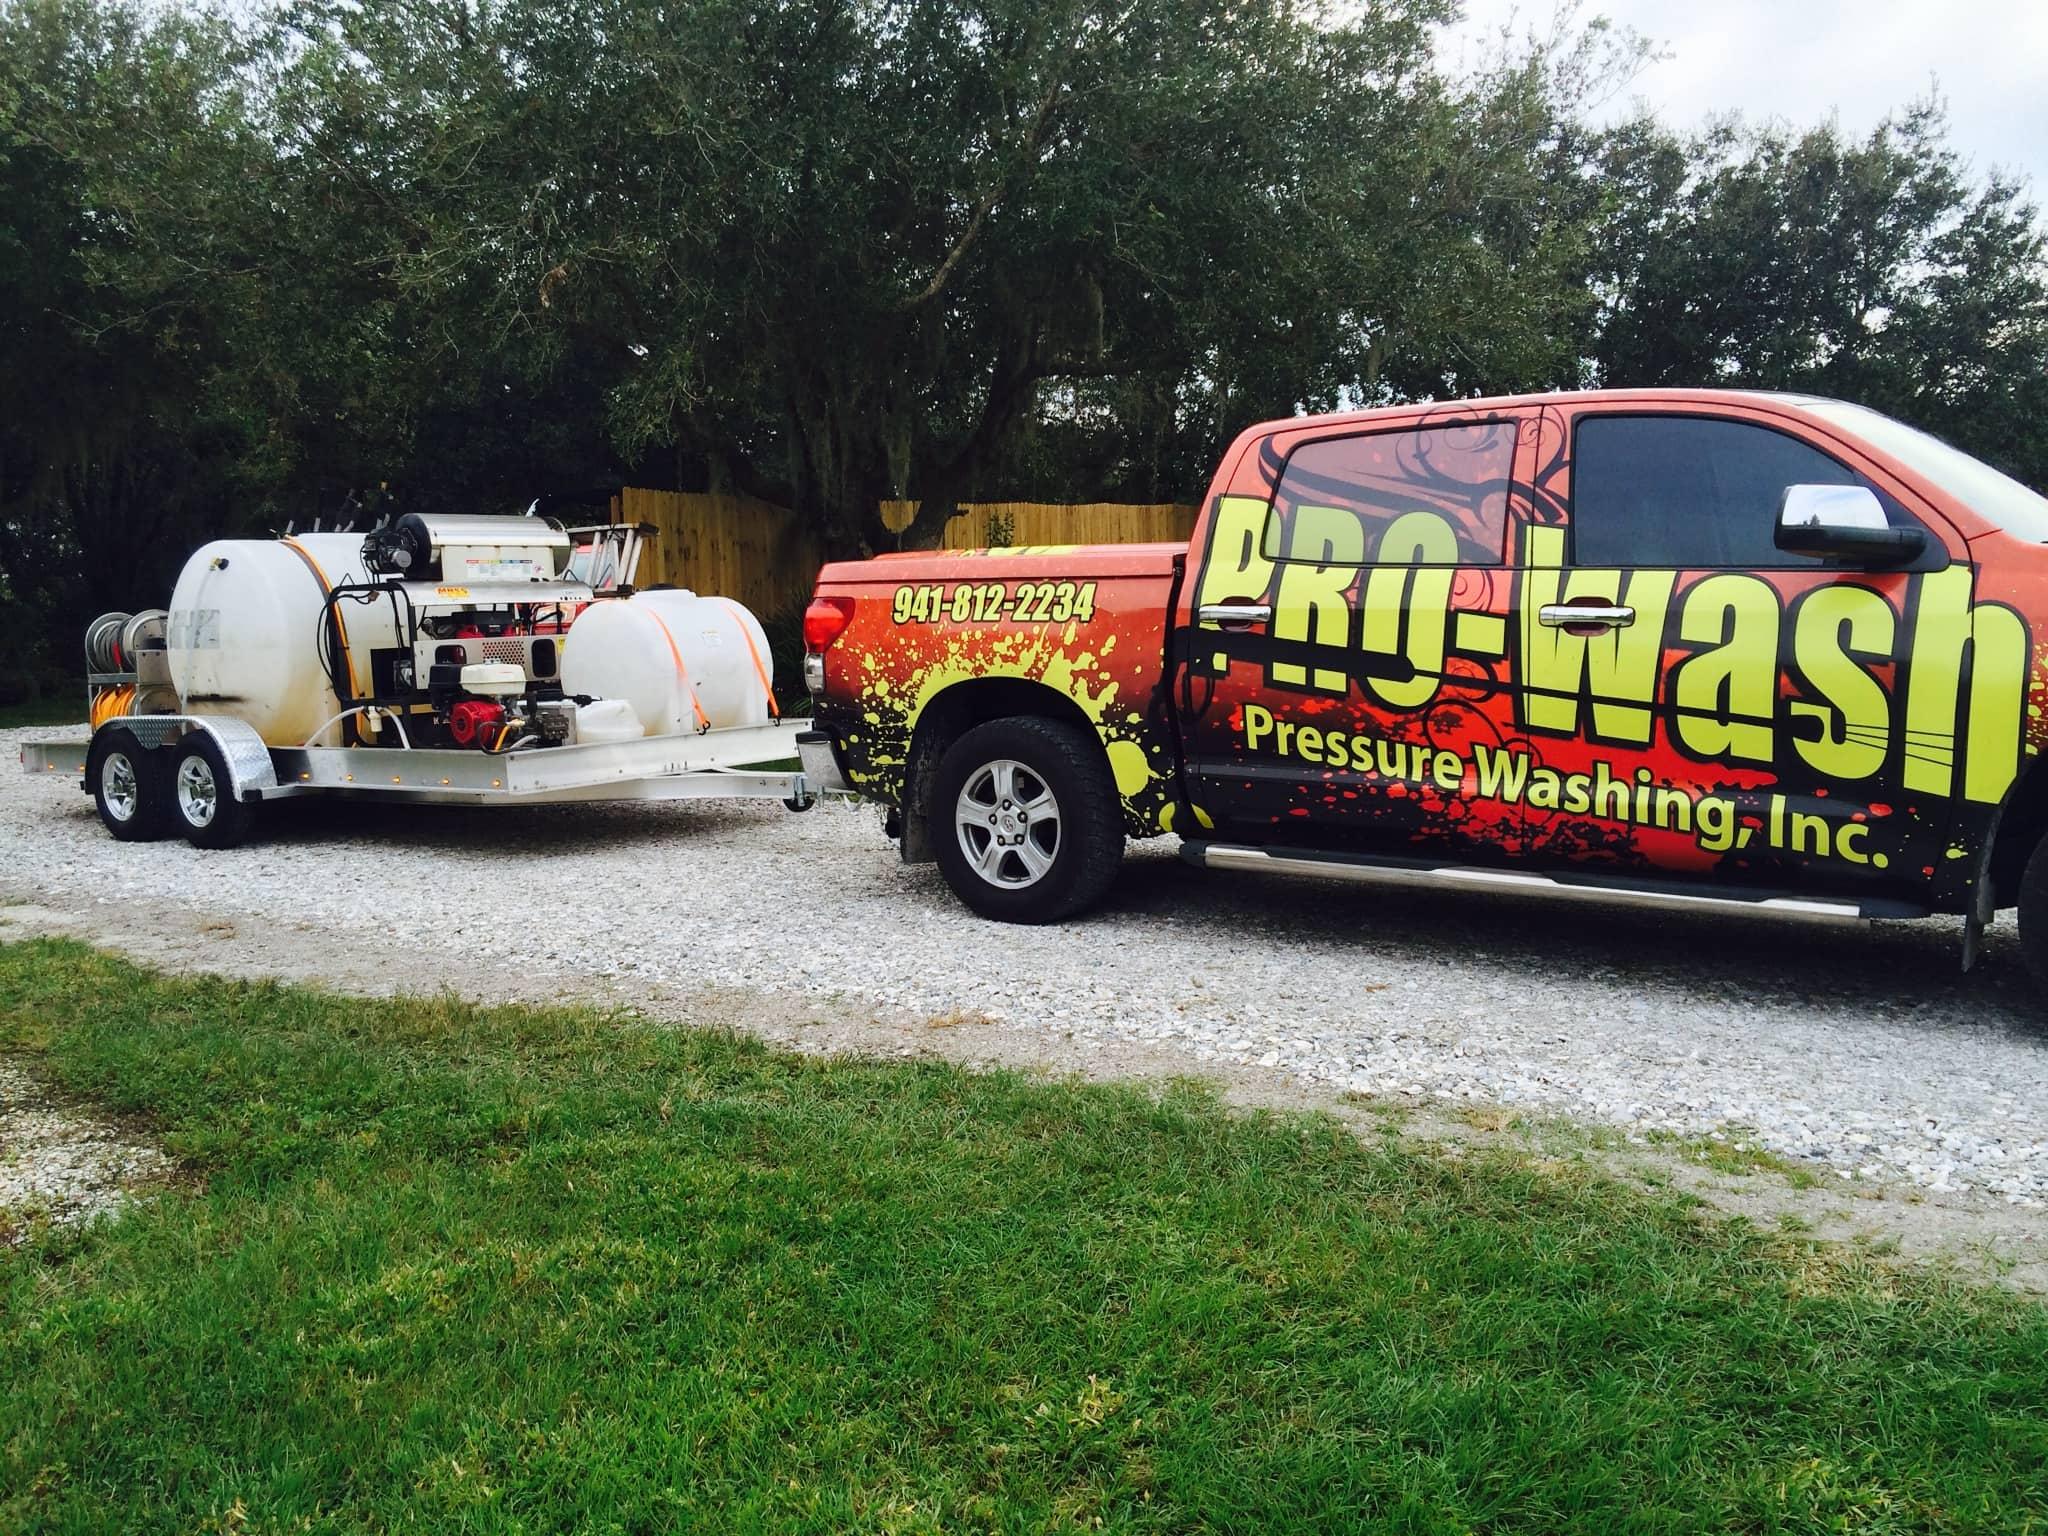 The Pro Wash Truck & Trailer